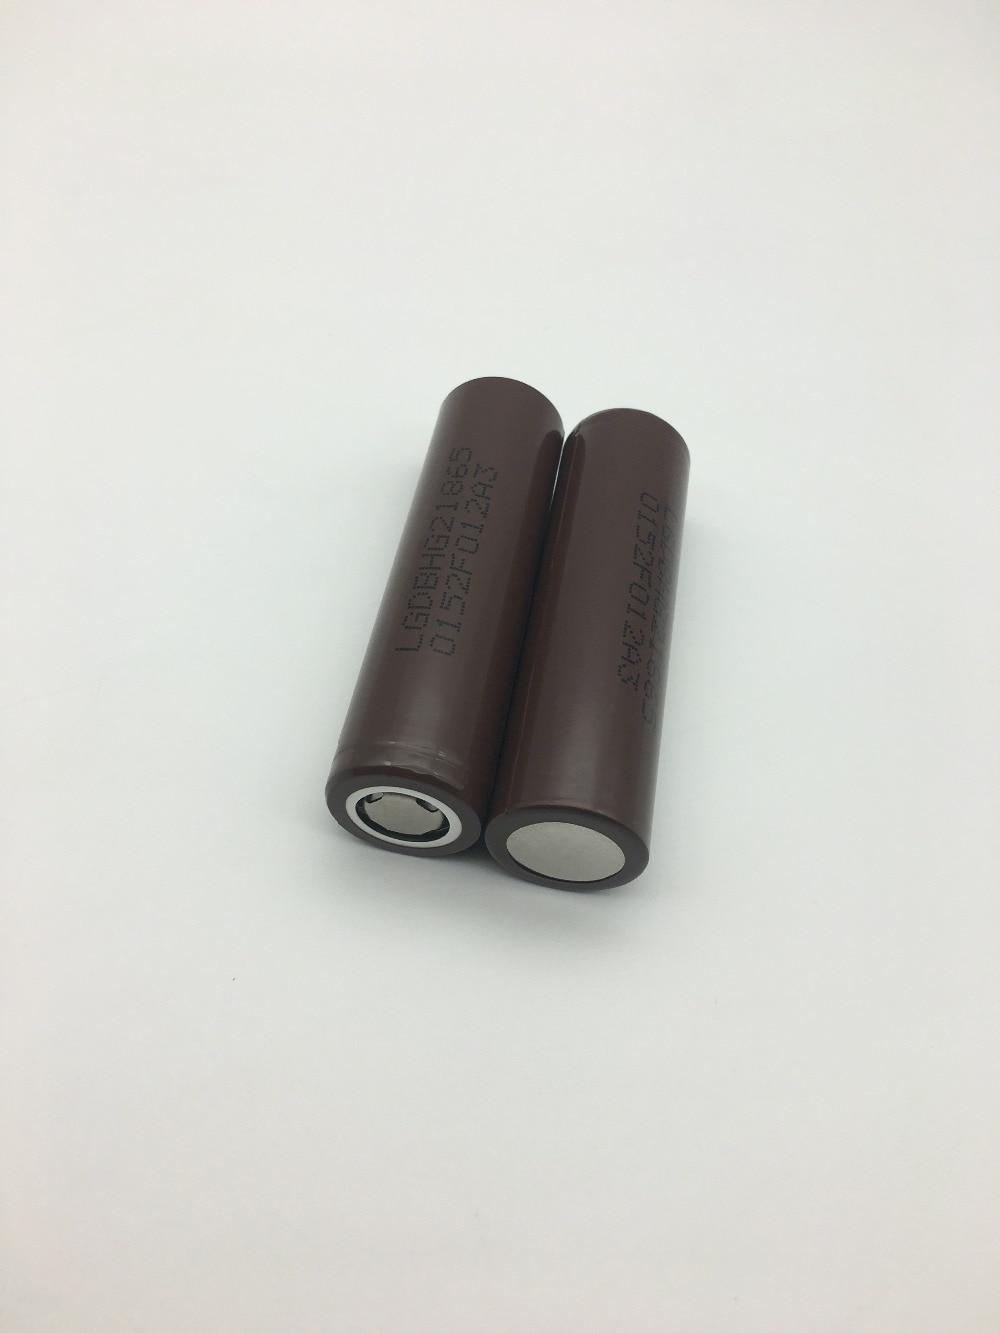 все цены на VariCore 100% New Original HG2 18650 3000mAh battery 18650HG2 3.6V discharge 20A, dedicated For LG E-cigarette Power battery онлайн